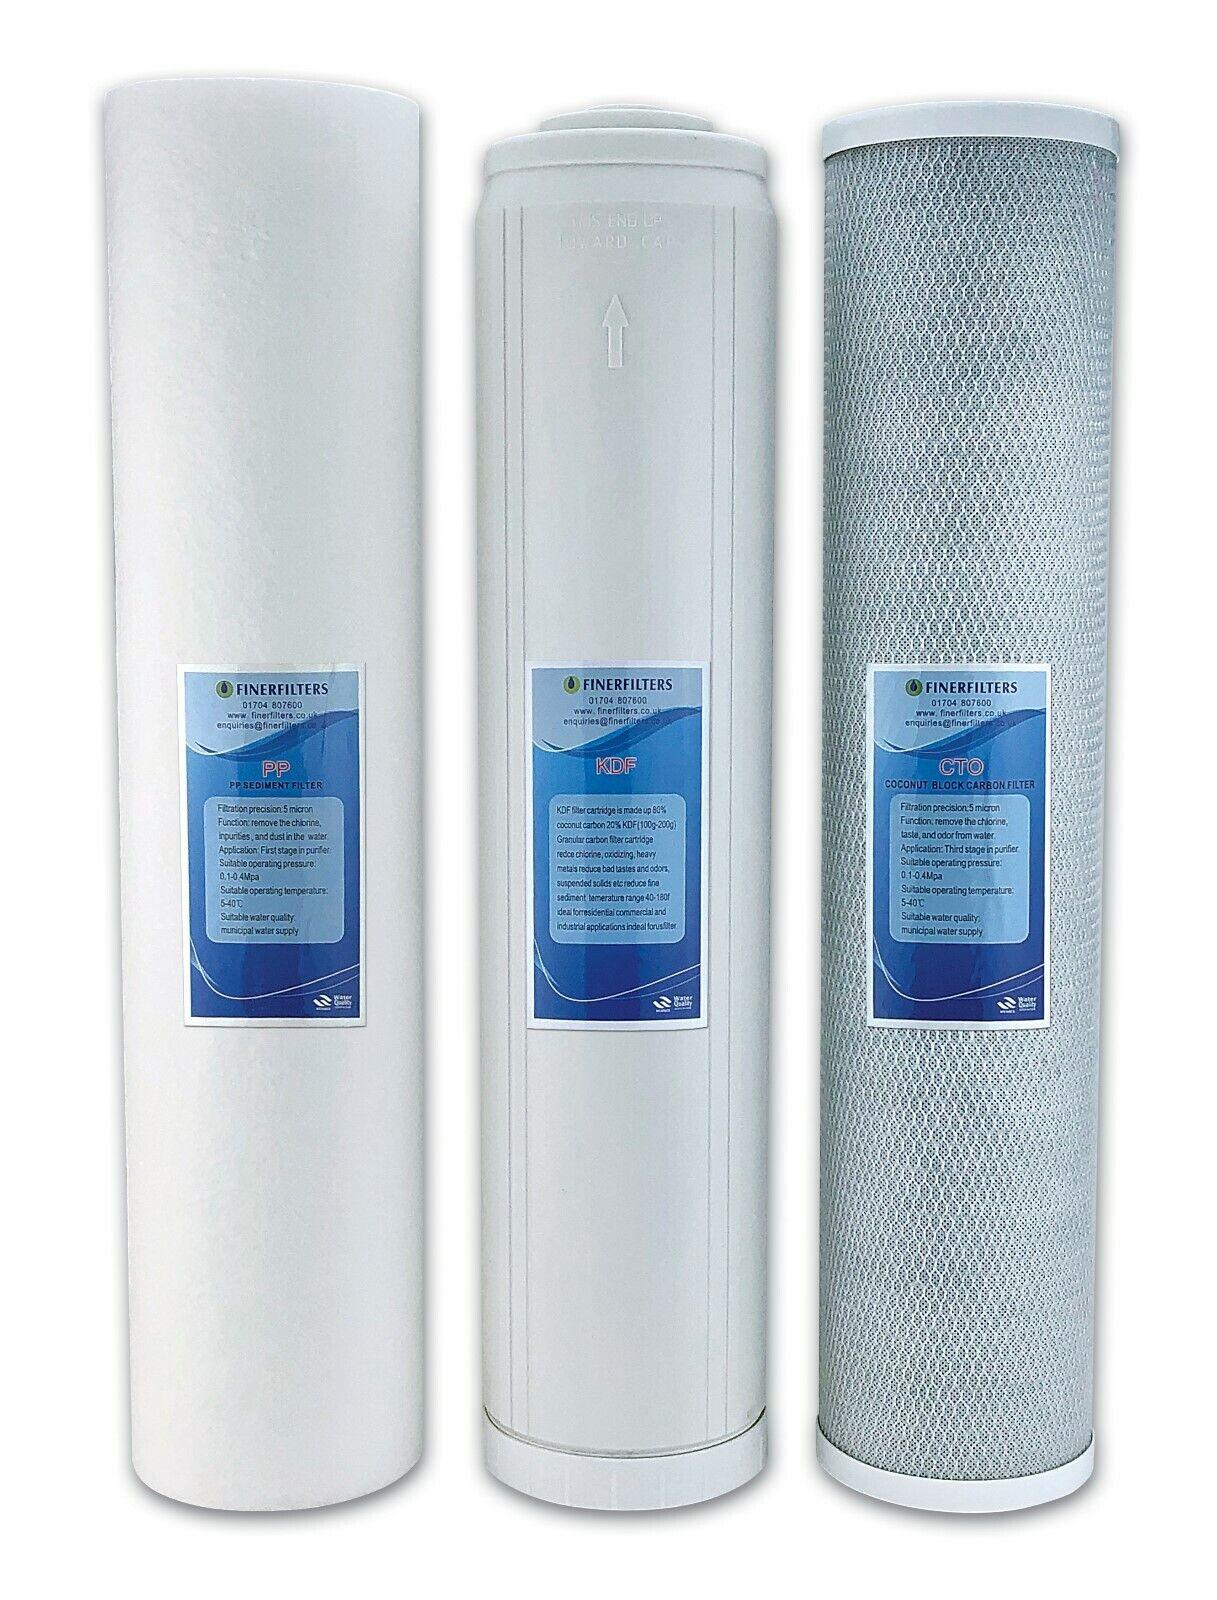 "Finerfilters 10"" x 4.5"" Jumbo GAC//KDF Water Filter Cartridge"